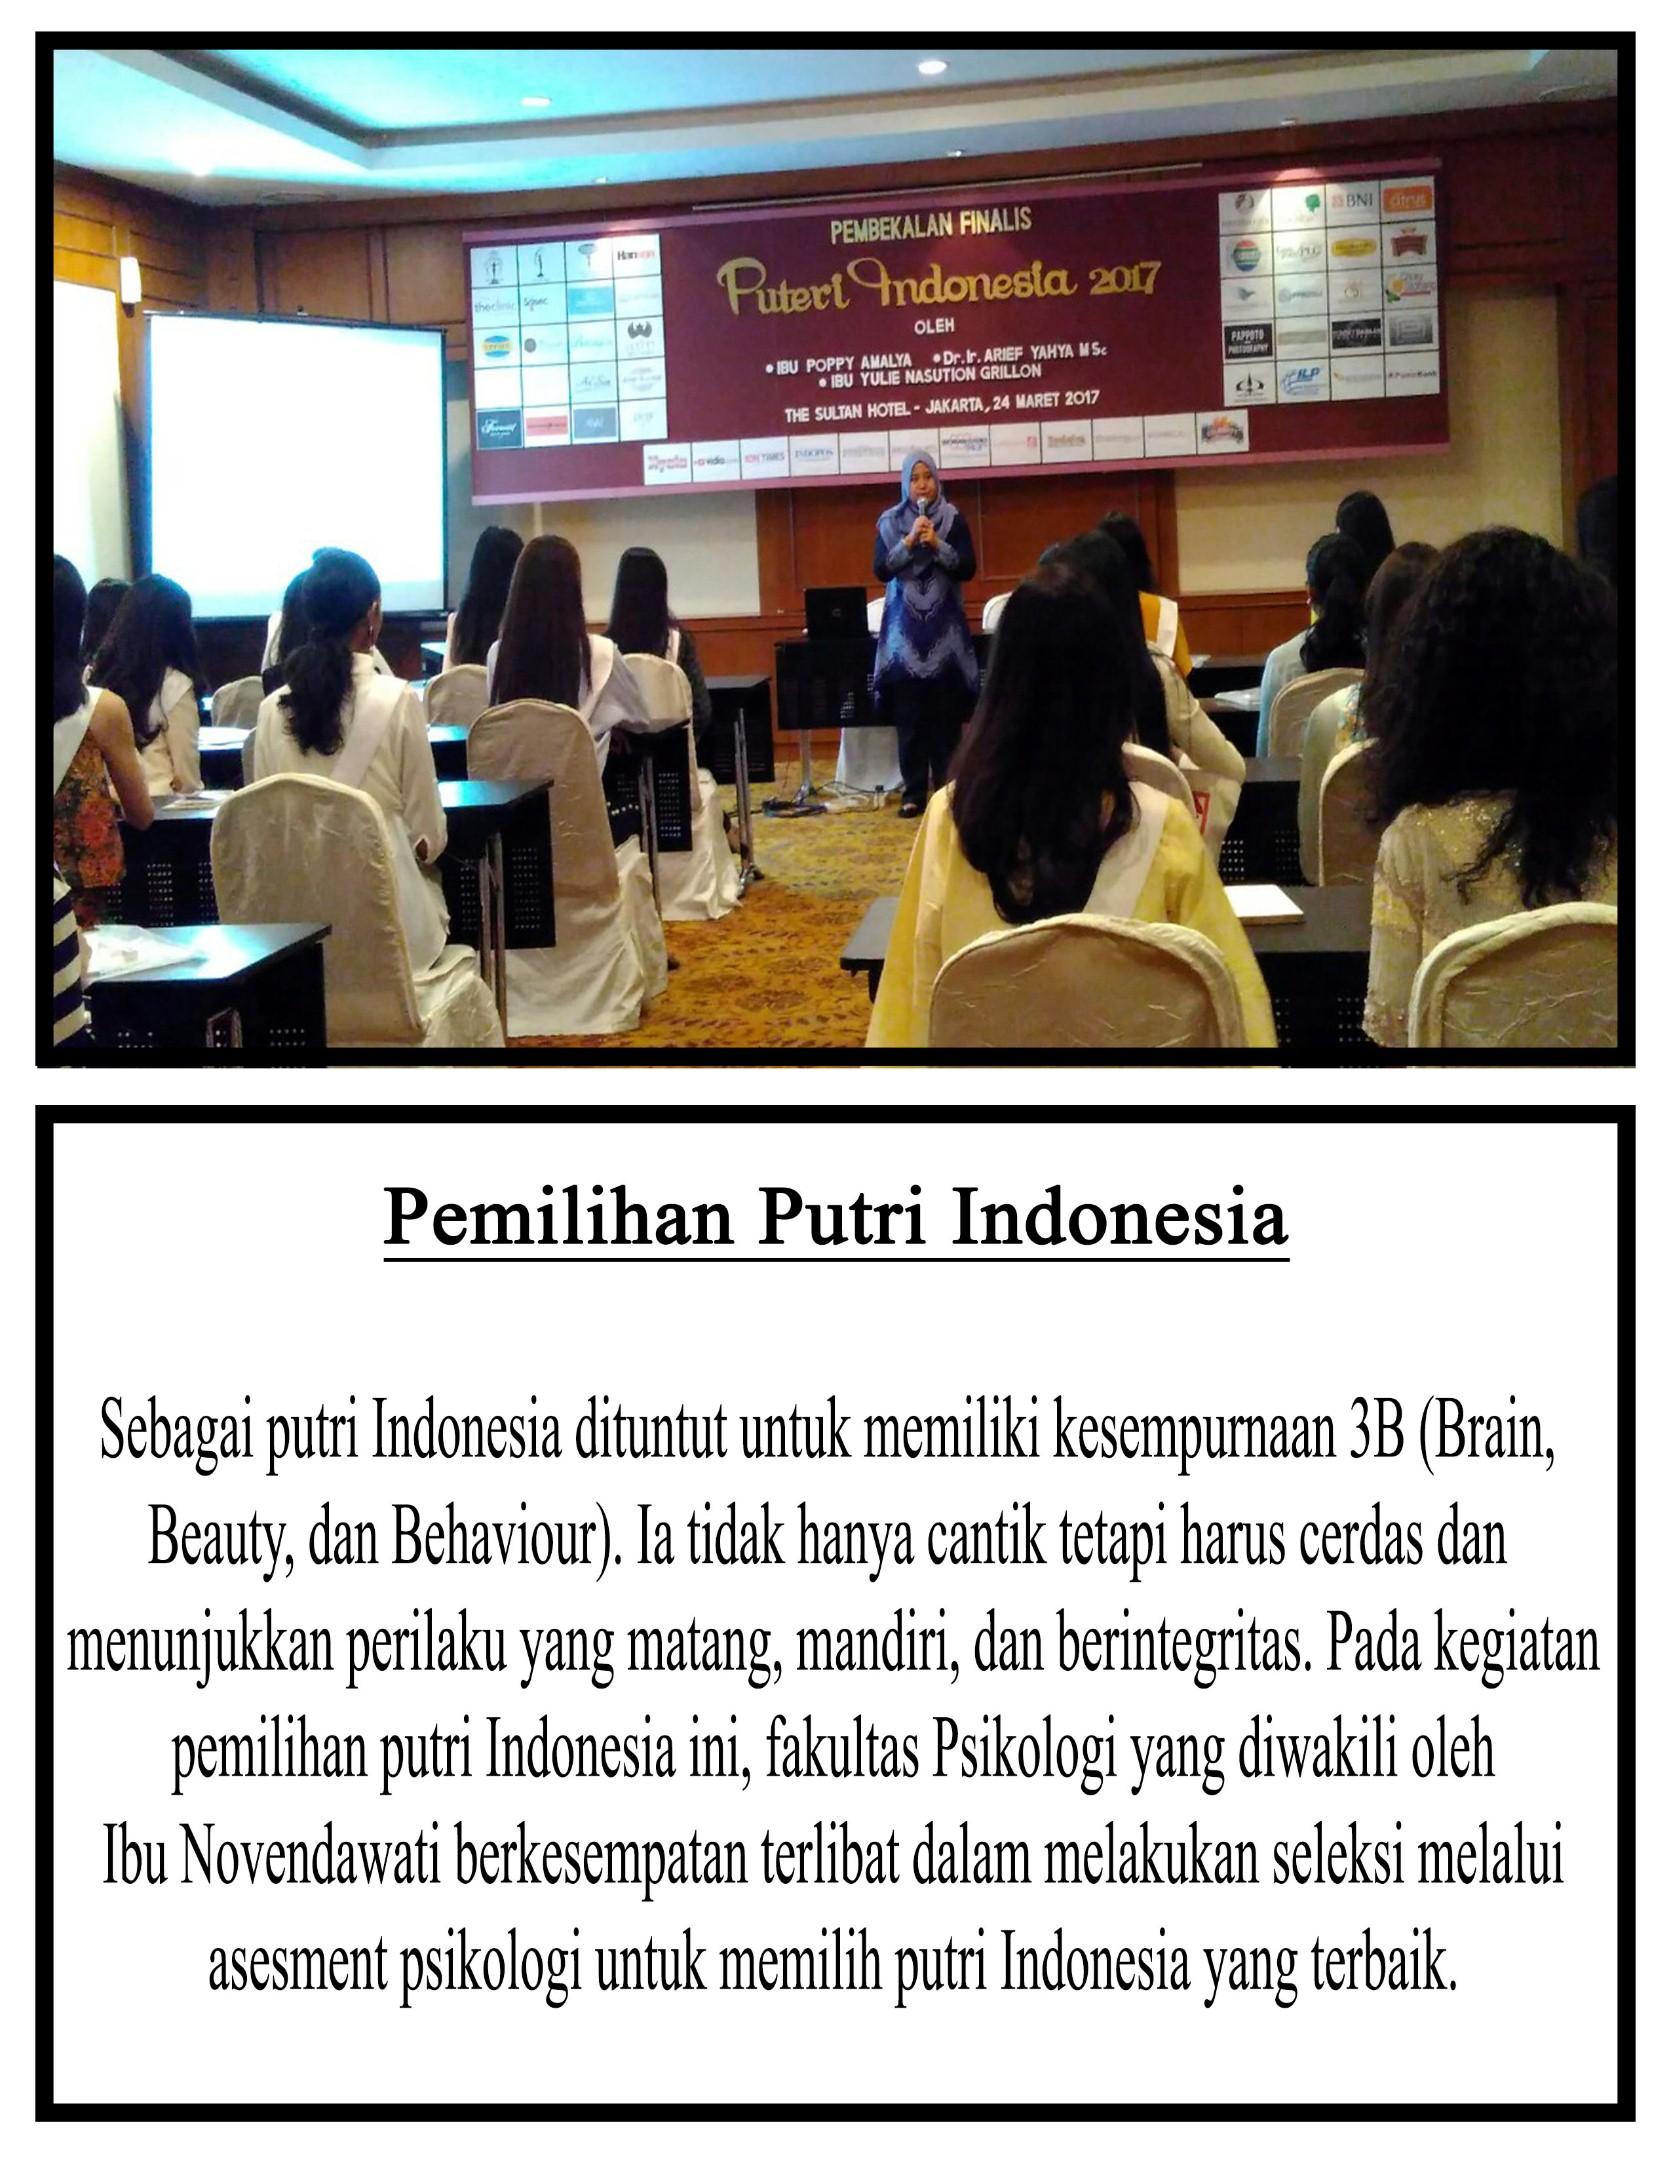 Dosen Esa Unggul Berikan Asesmen Psikologi Finalis Puteri Indonesia